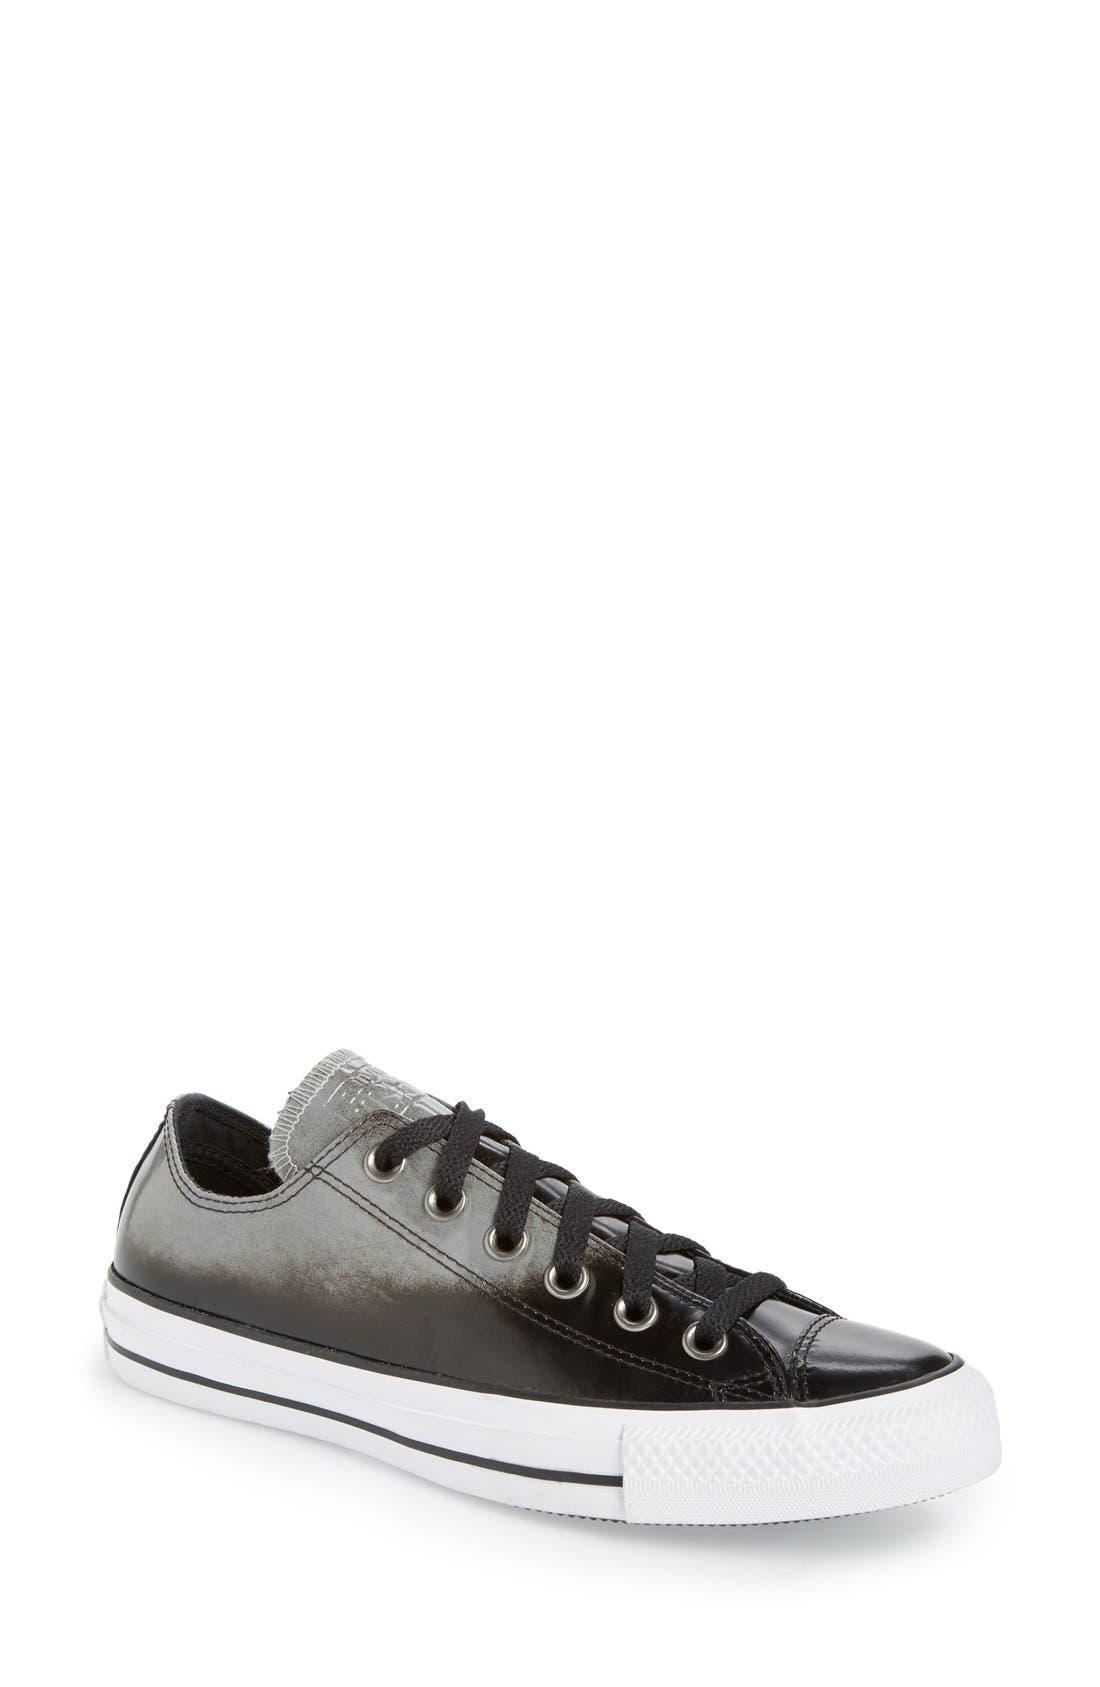 Main Image - Converse All Star®Chuck Taylor® 'OmbréOx' Sneaker (Women)